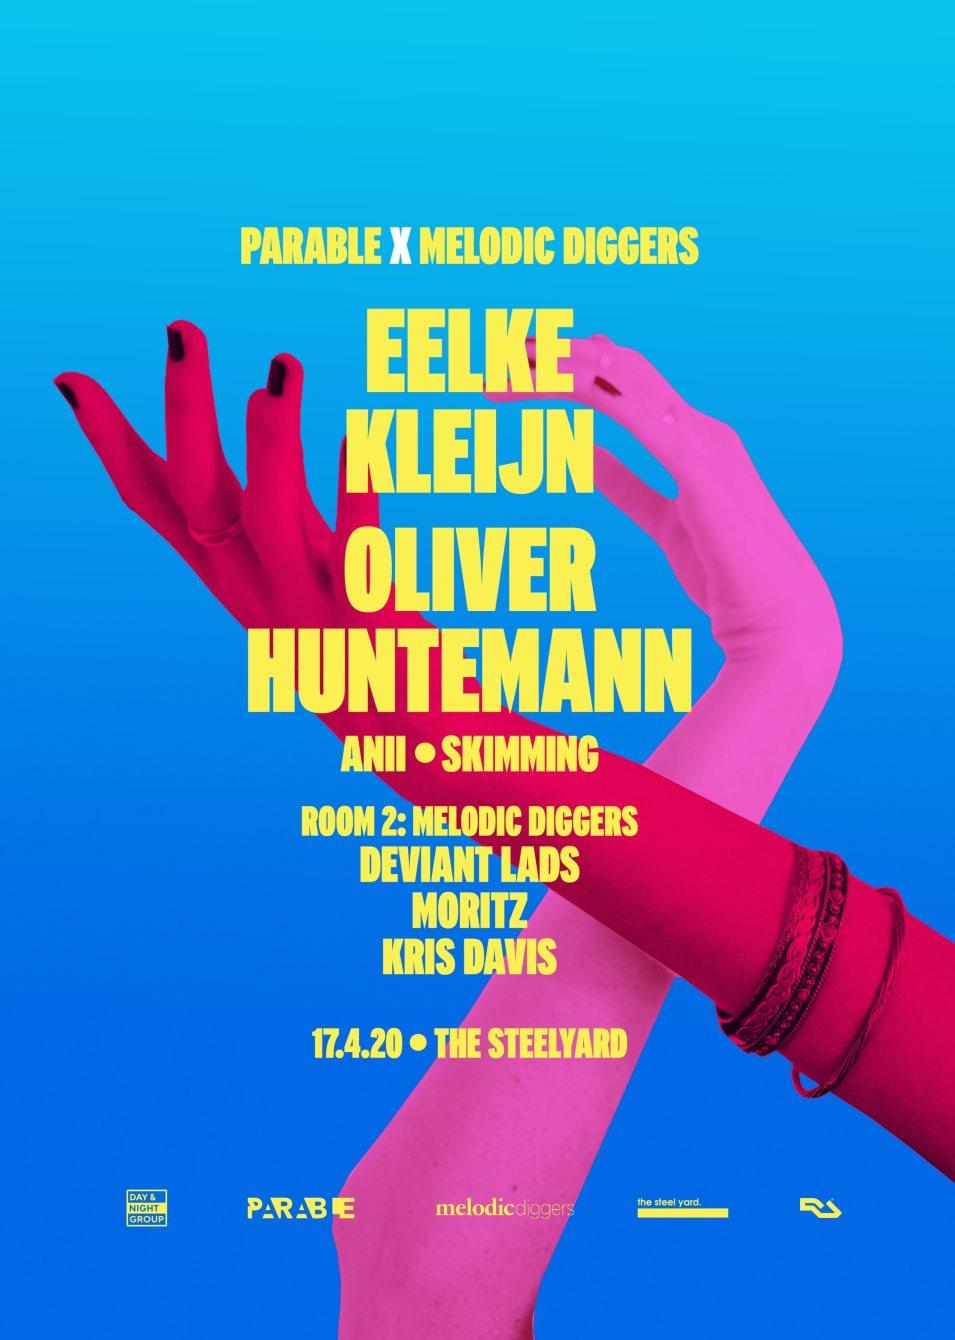 {POSTPONED} Parable x Melodic Diggers: Eelke Kleijn, Oliver Huntemann, Anii, Melodic Diggers - Flyer back